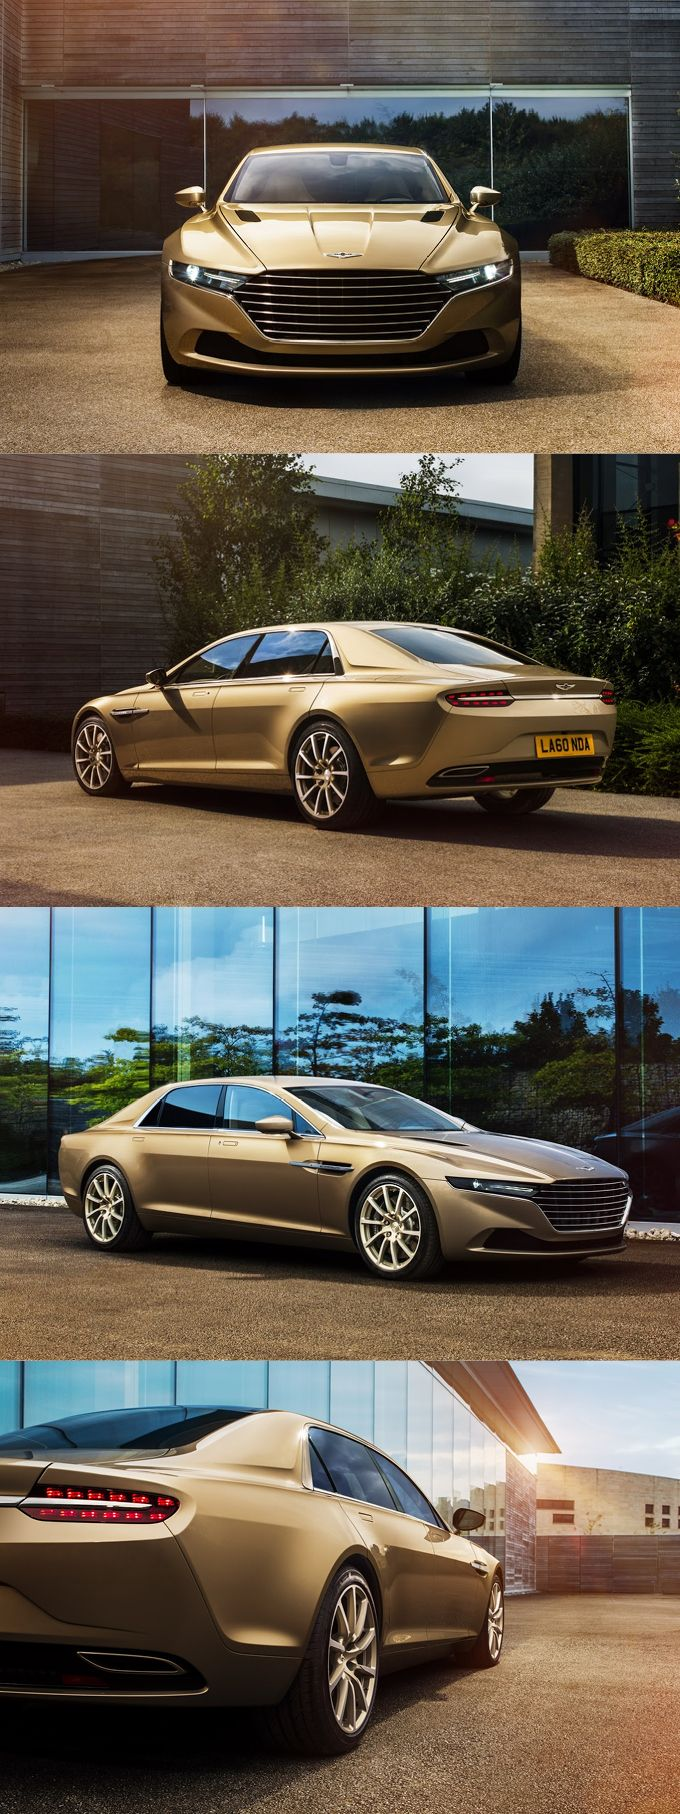 2015 Lagonda Taraf / beige / UK / Aston Martin / 6.0l V12 / Marek Reichman / 17-344